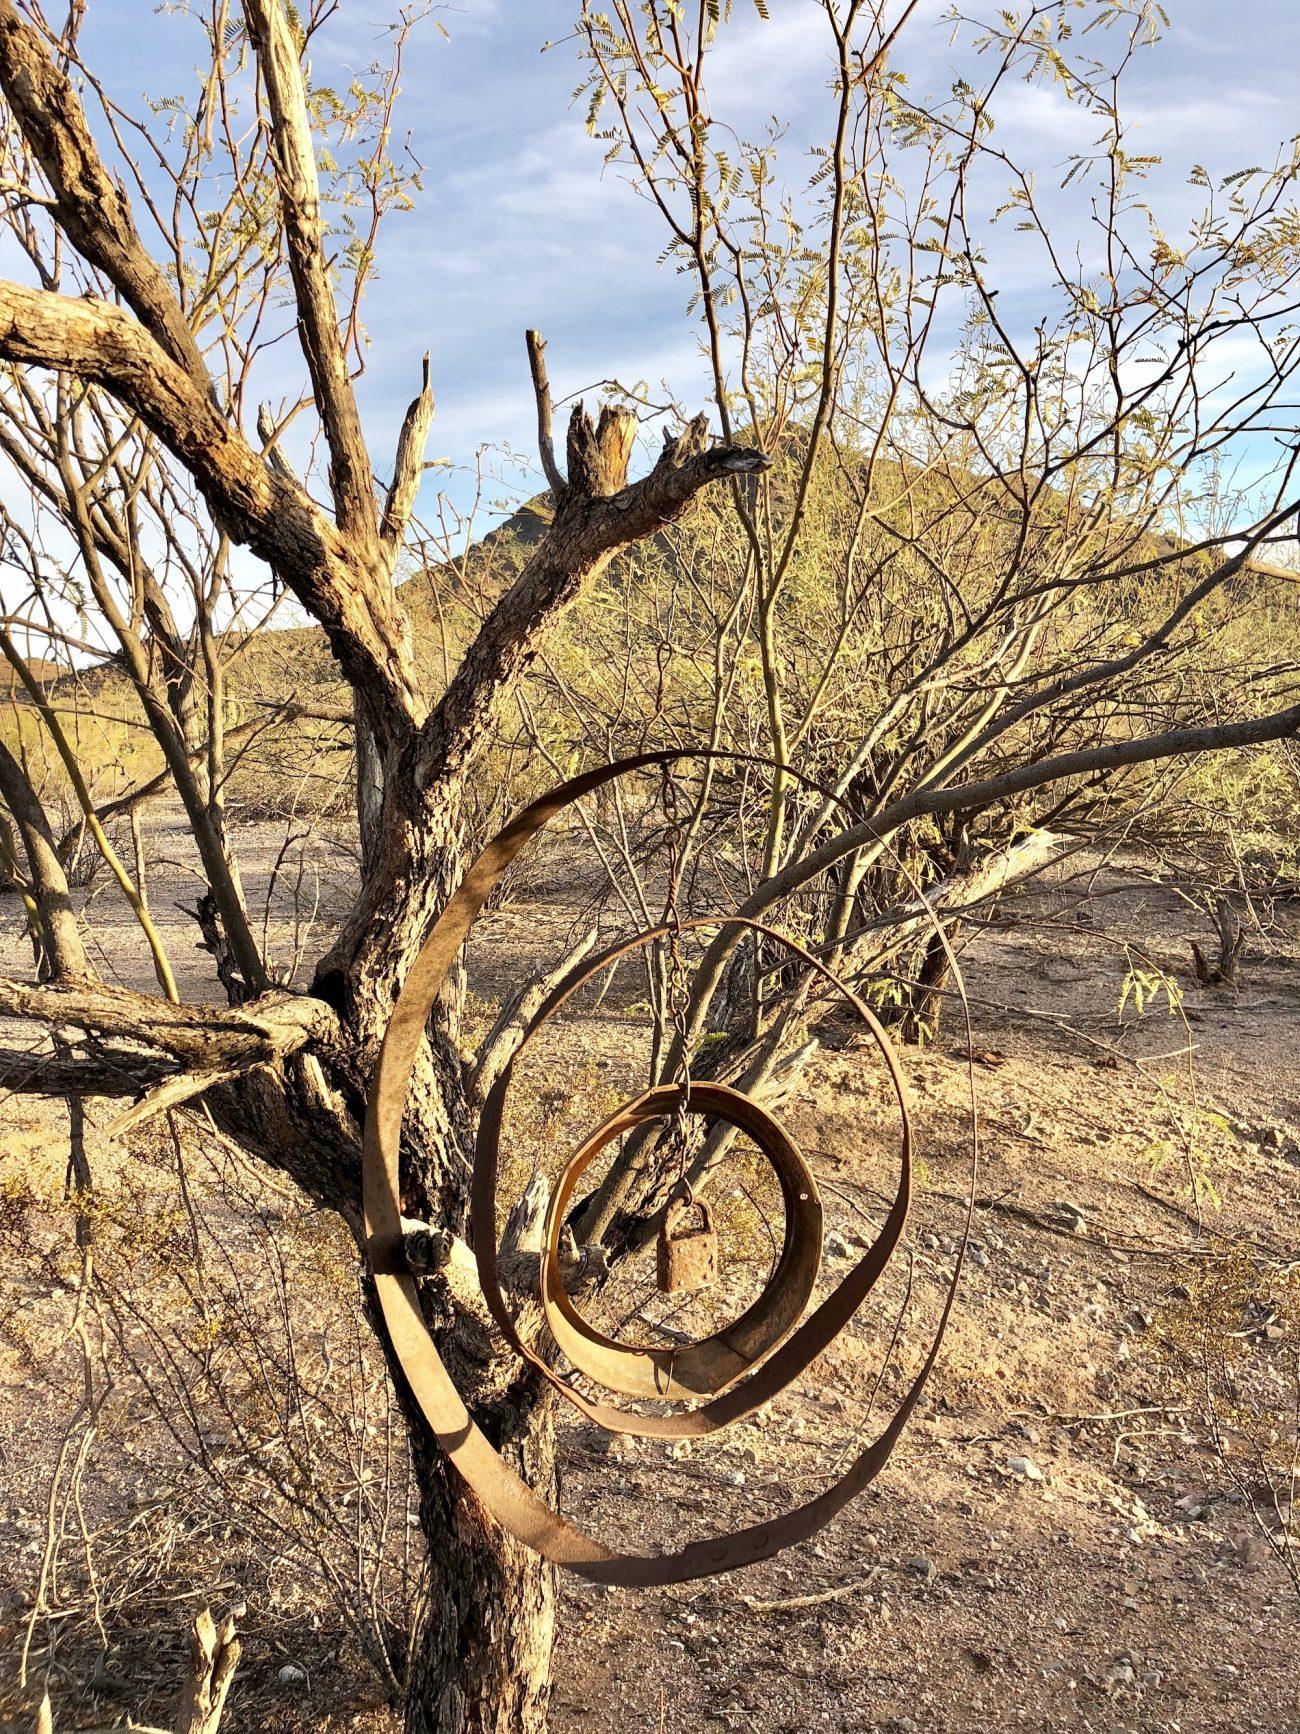 Metal work hanging in tree outside of Ajo, AZ.